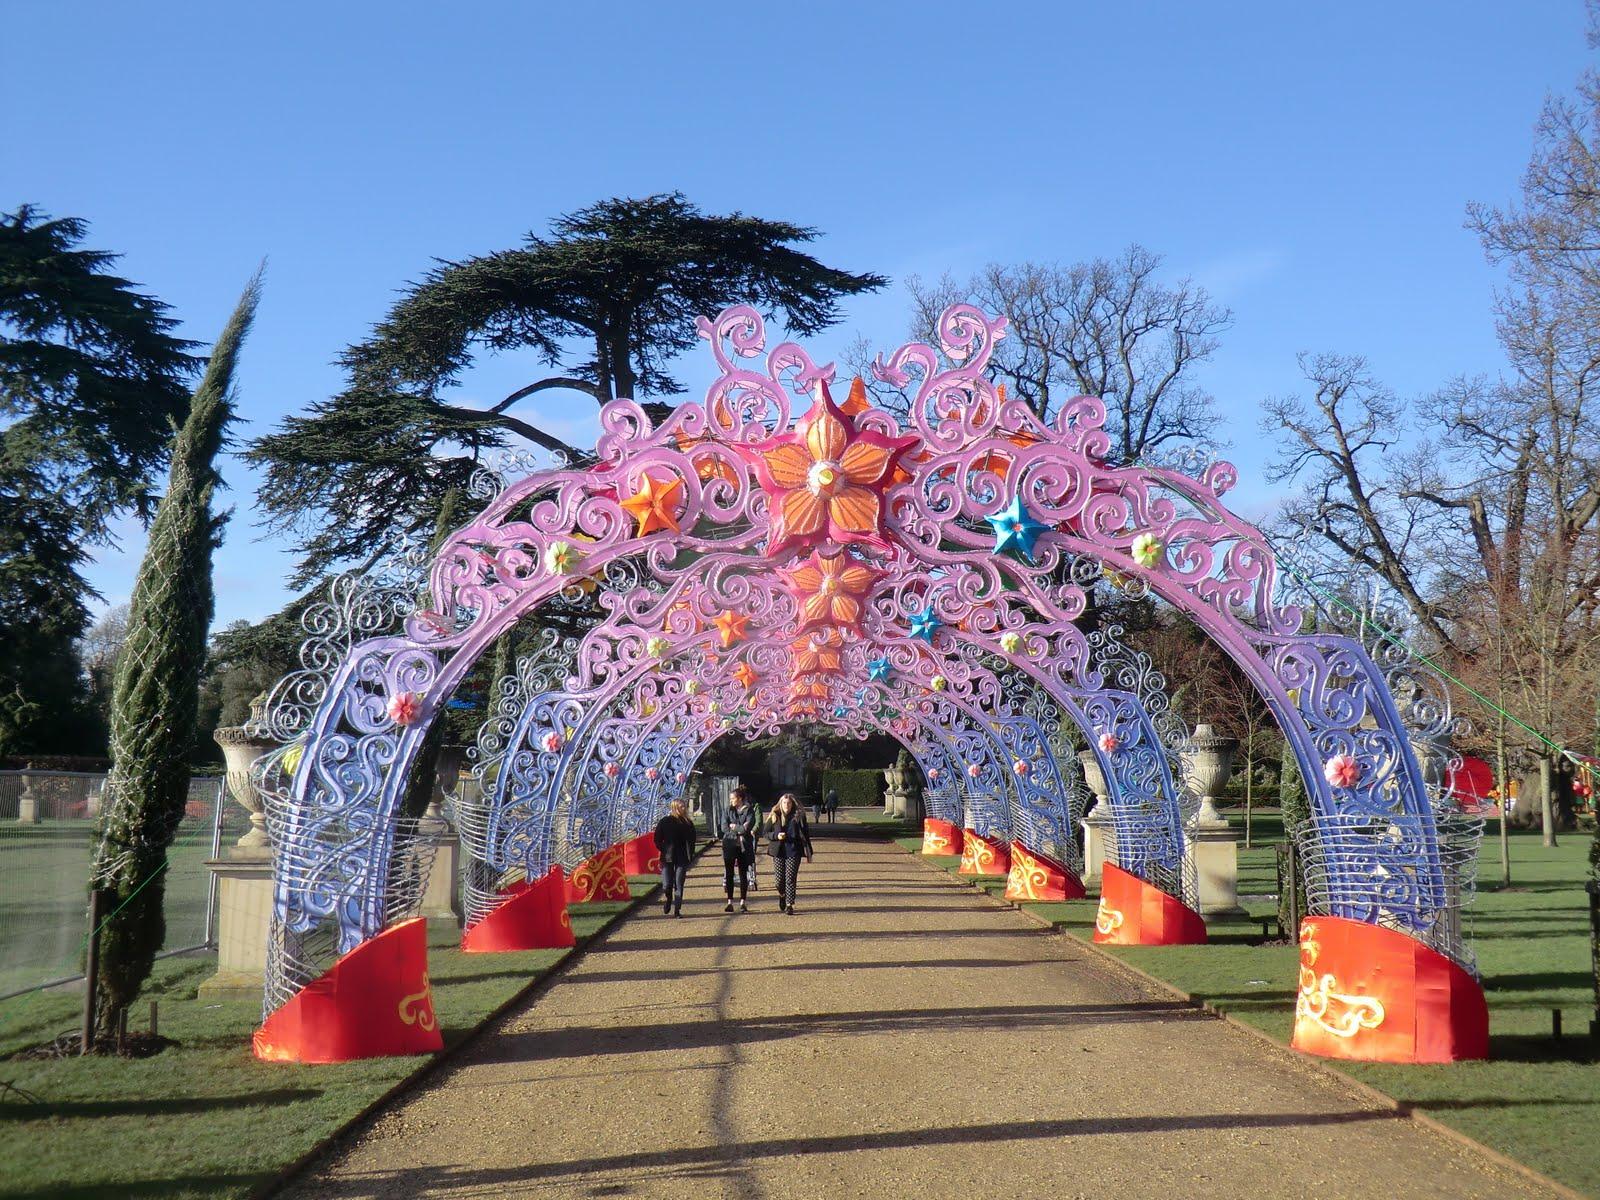 CIMG2510 Magical Lantern Festival 2016, Chiswick House